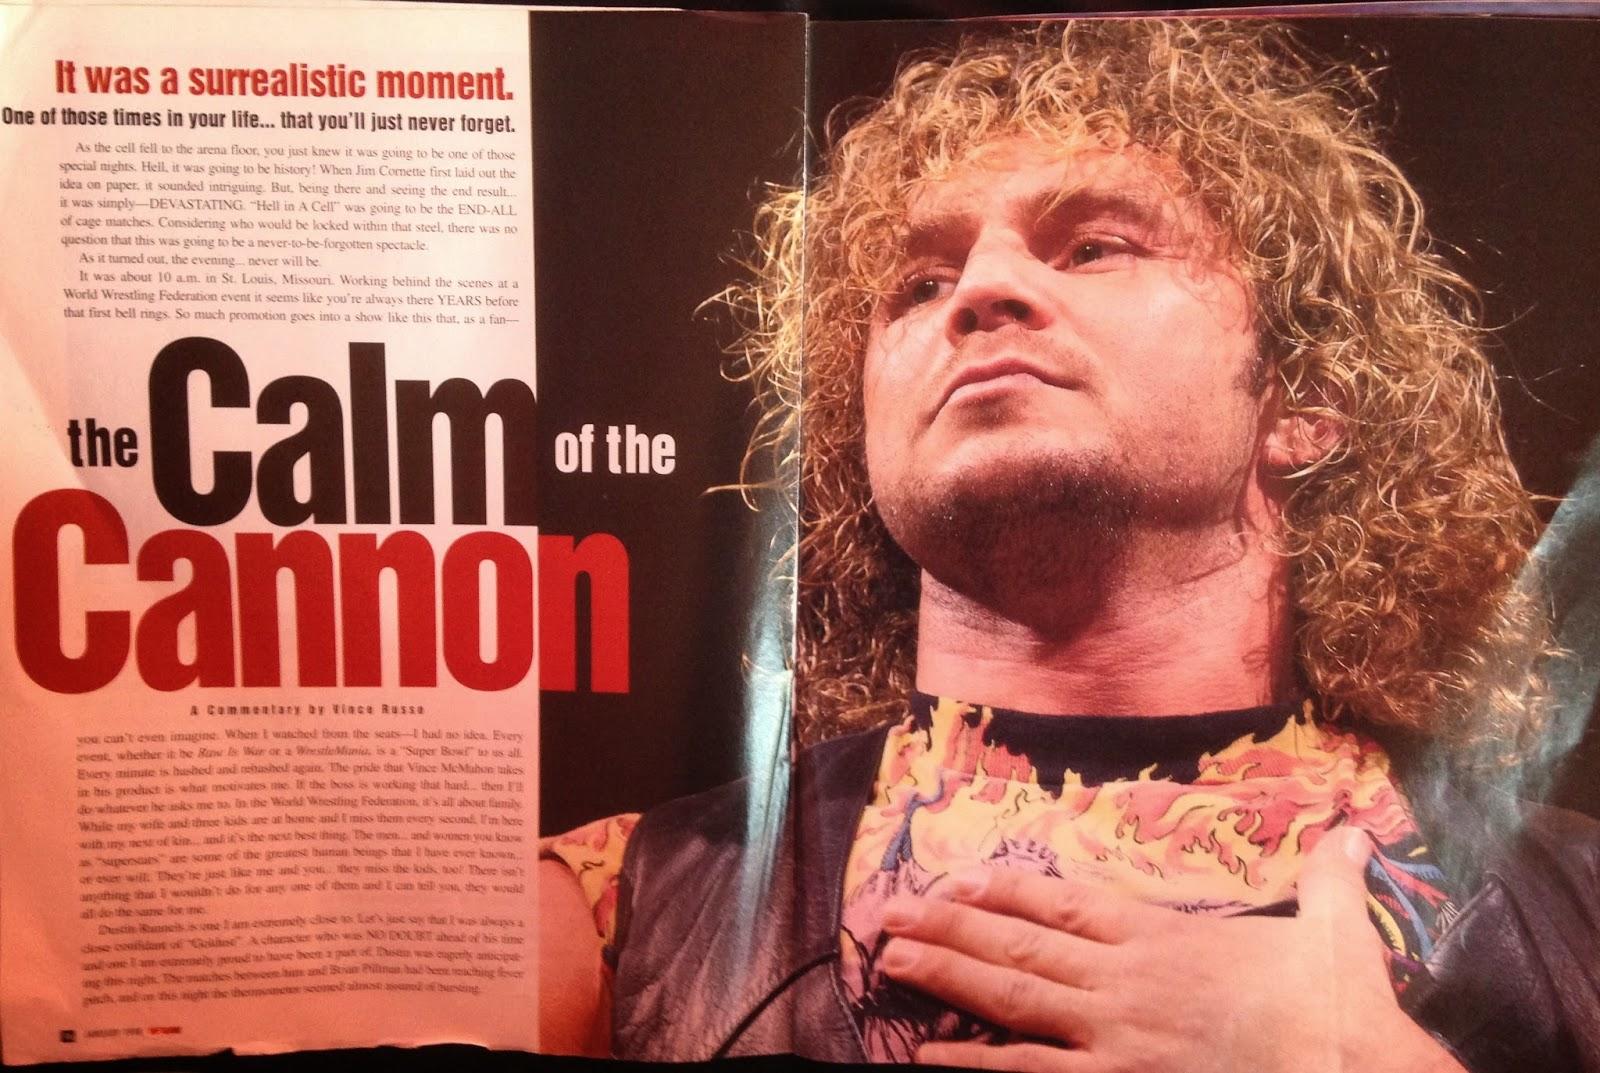 WWE: WWF RAW MAGAZINE - January 1998 - In memory of Brian Pillman